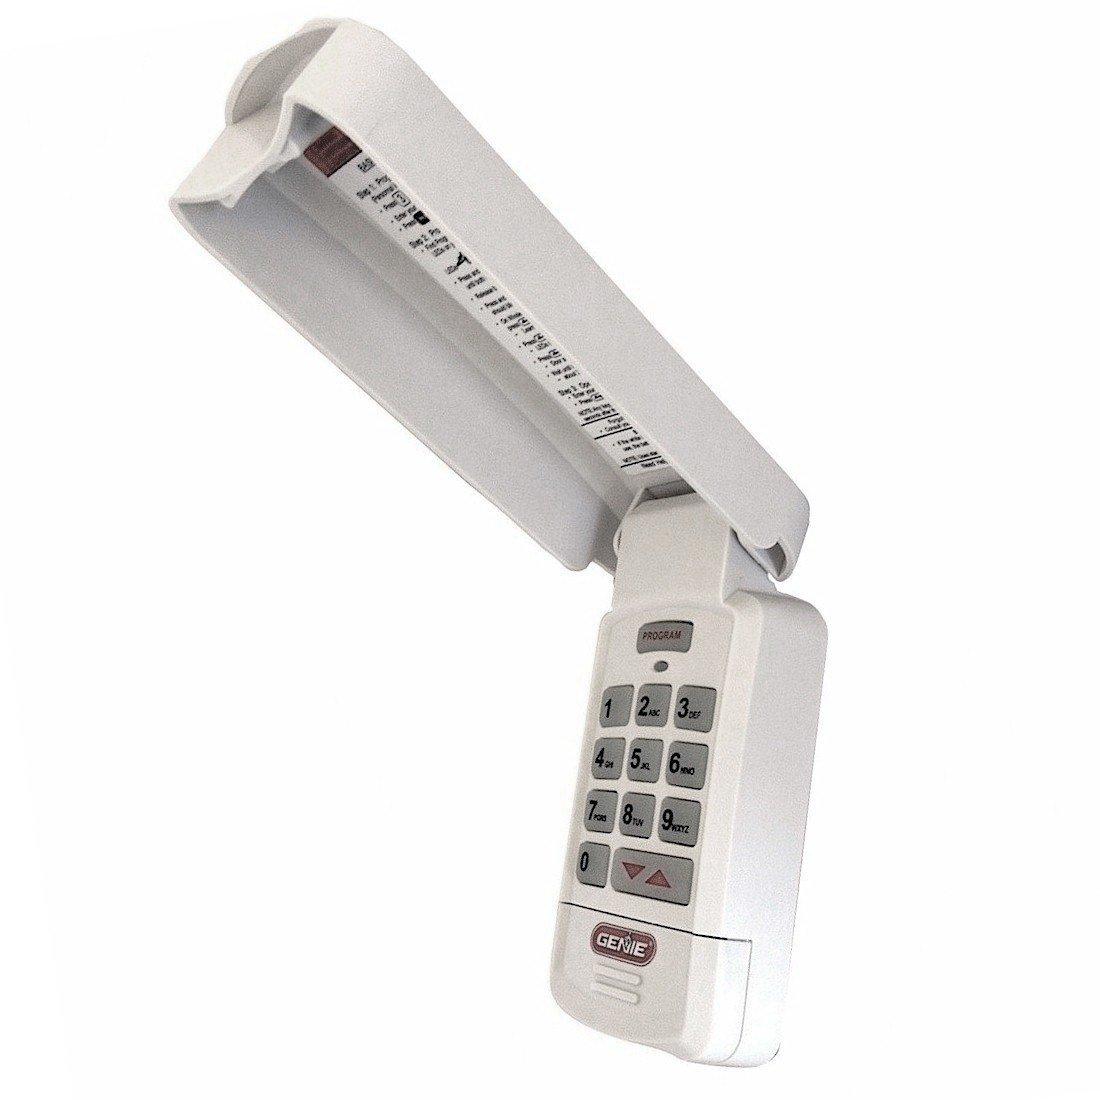 Genie Gk Bx Intellicode Wireless Keypad 37224r Overhead